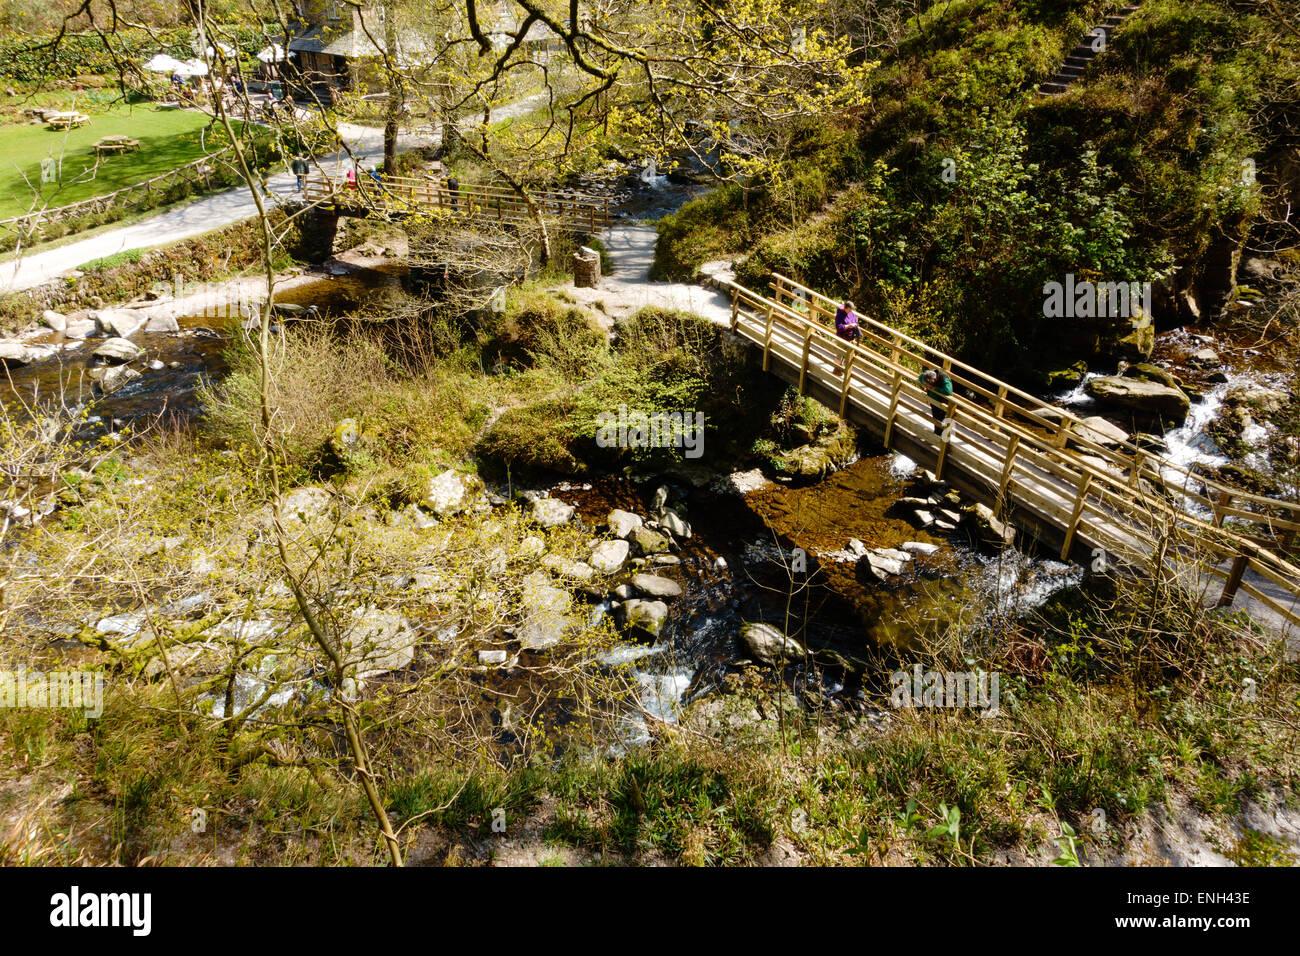 Watersmeet on Exmoor where the East Lyn river and Hoar Oak water meet in North Devon - Stock Image